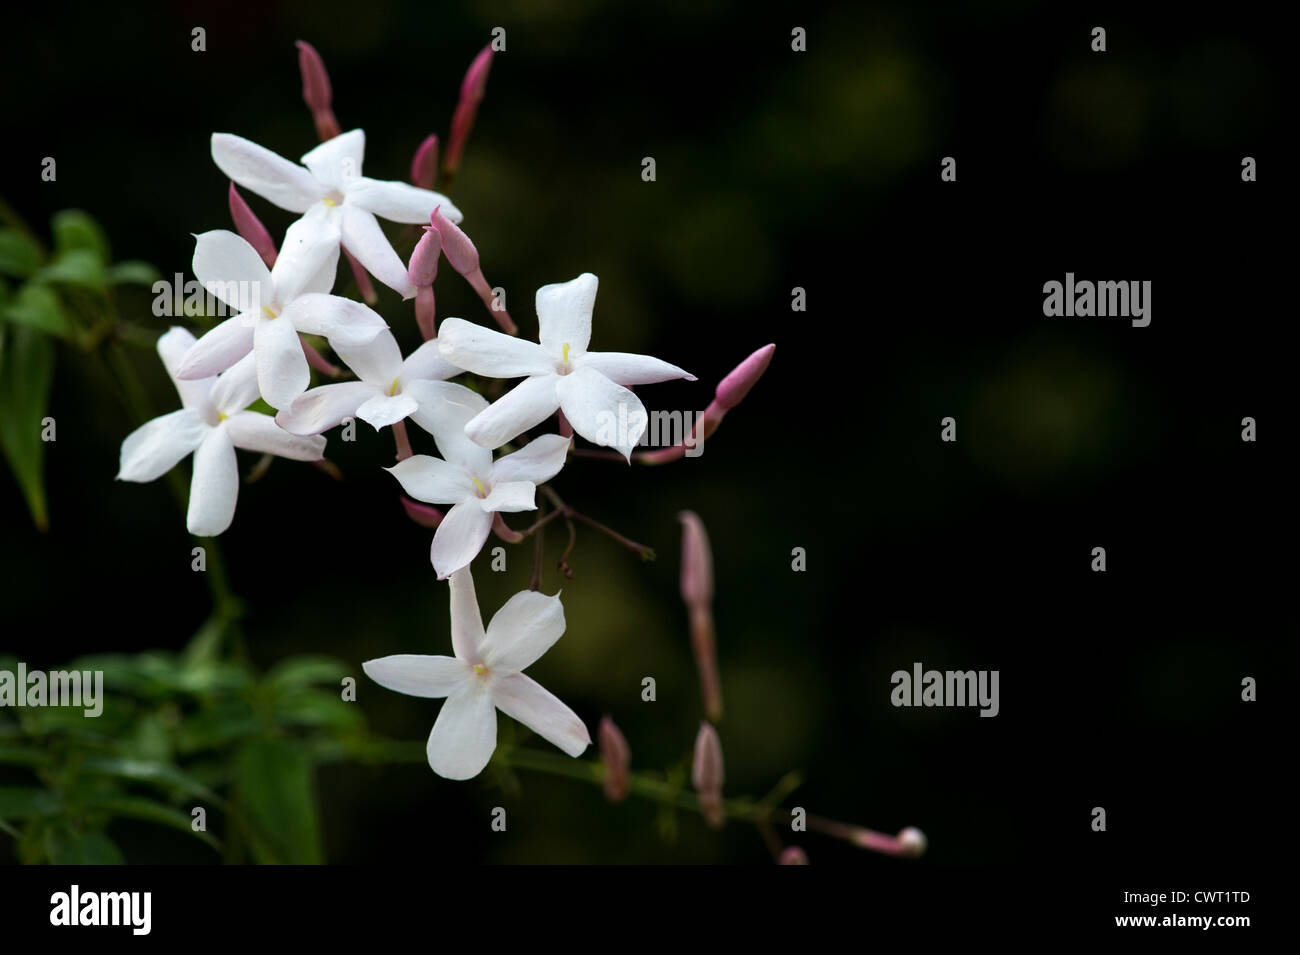 White jasmine stock photos white jasmine stock images alamy many flowered jasmine white jasmine flowers stock image izmirmasajfo